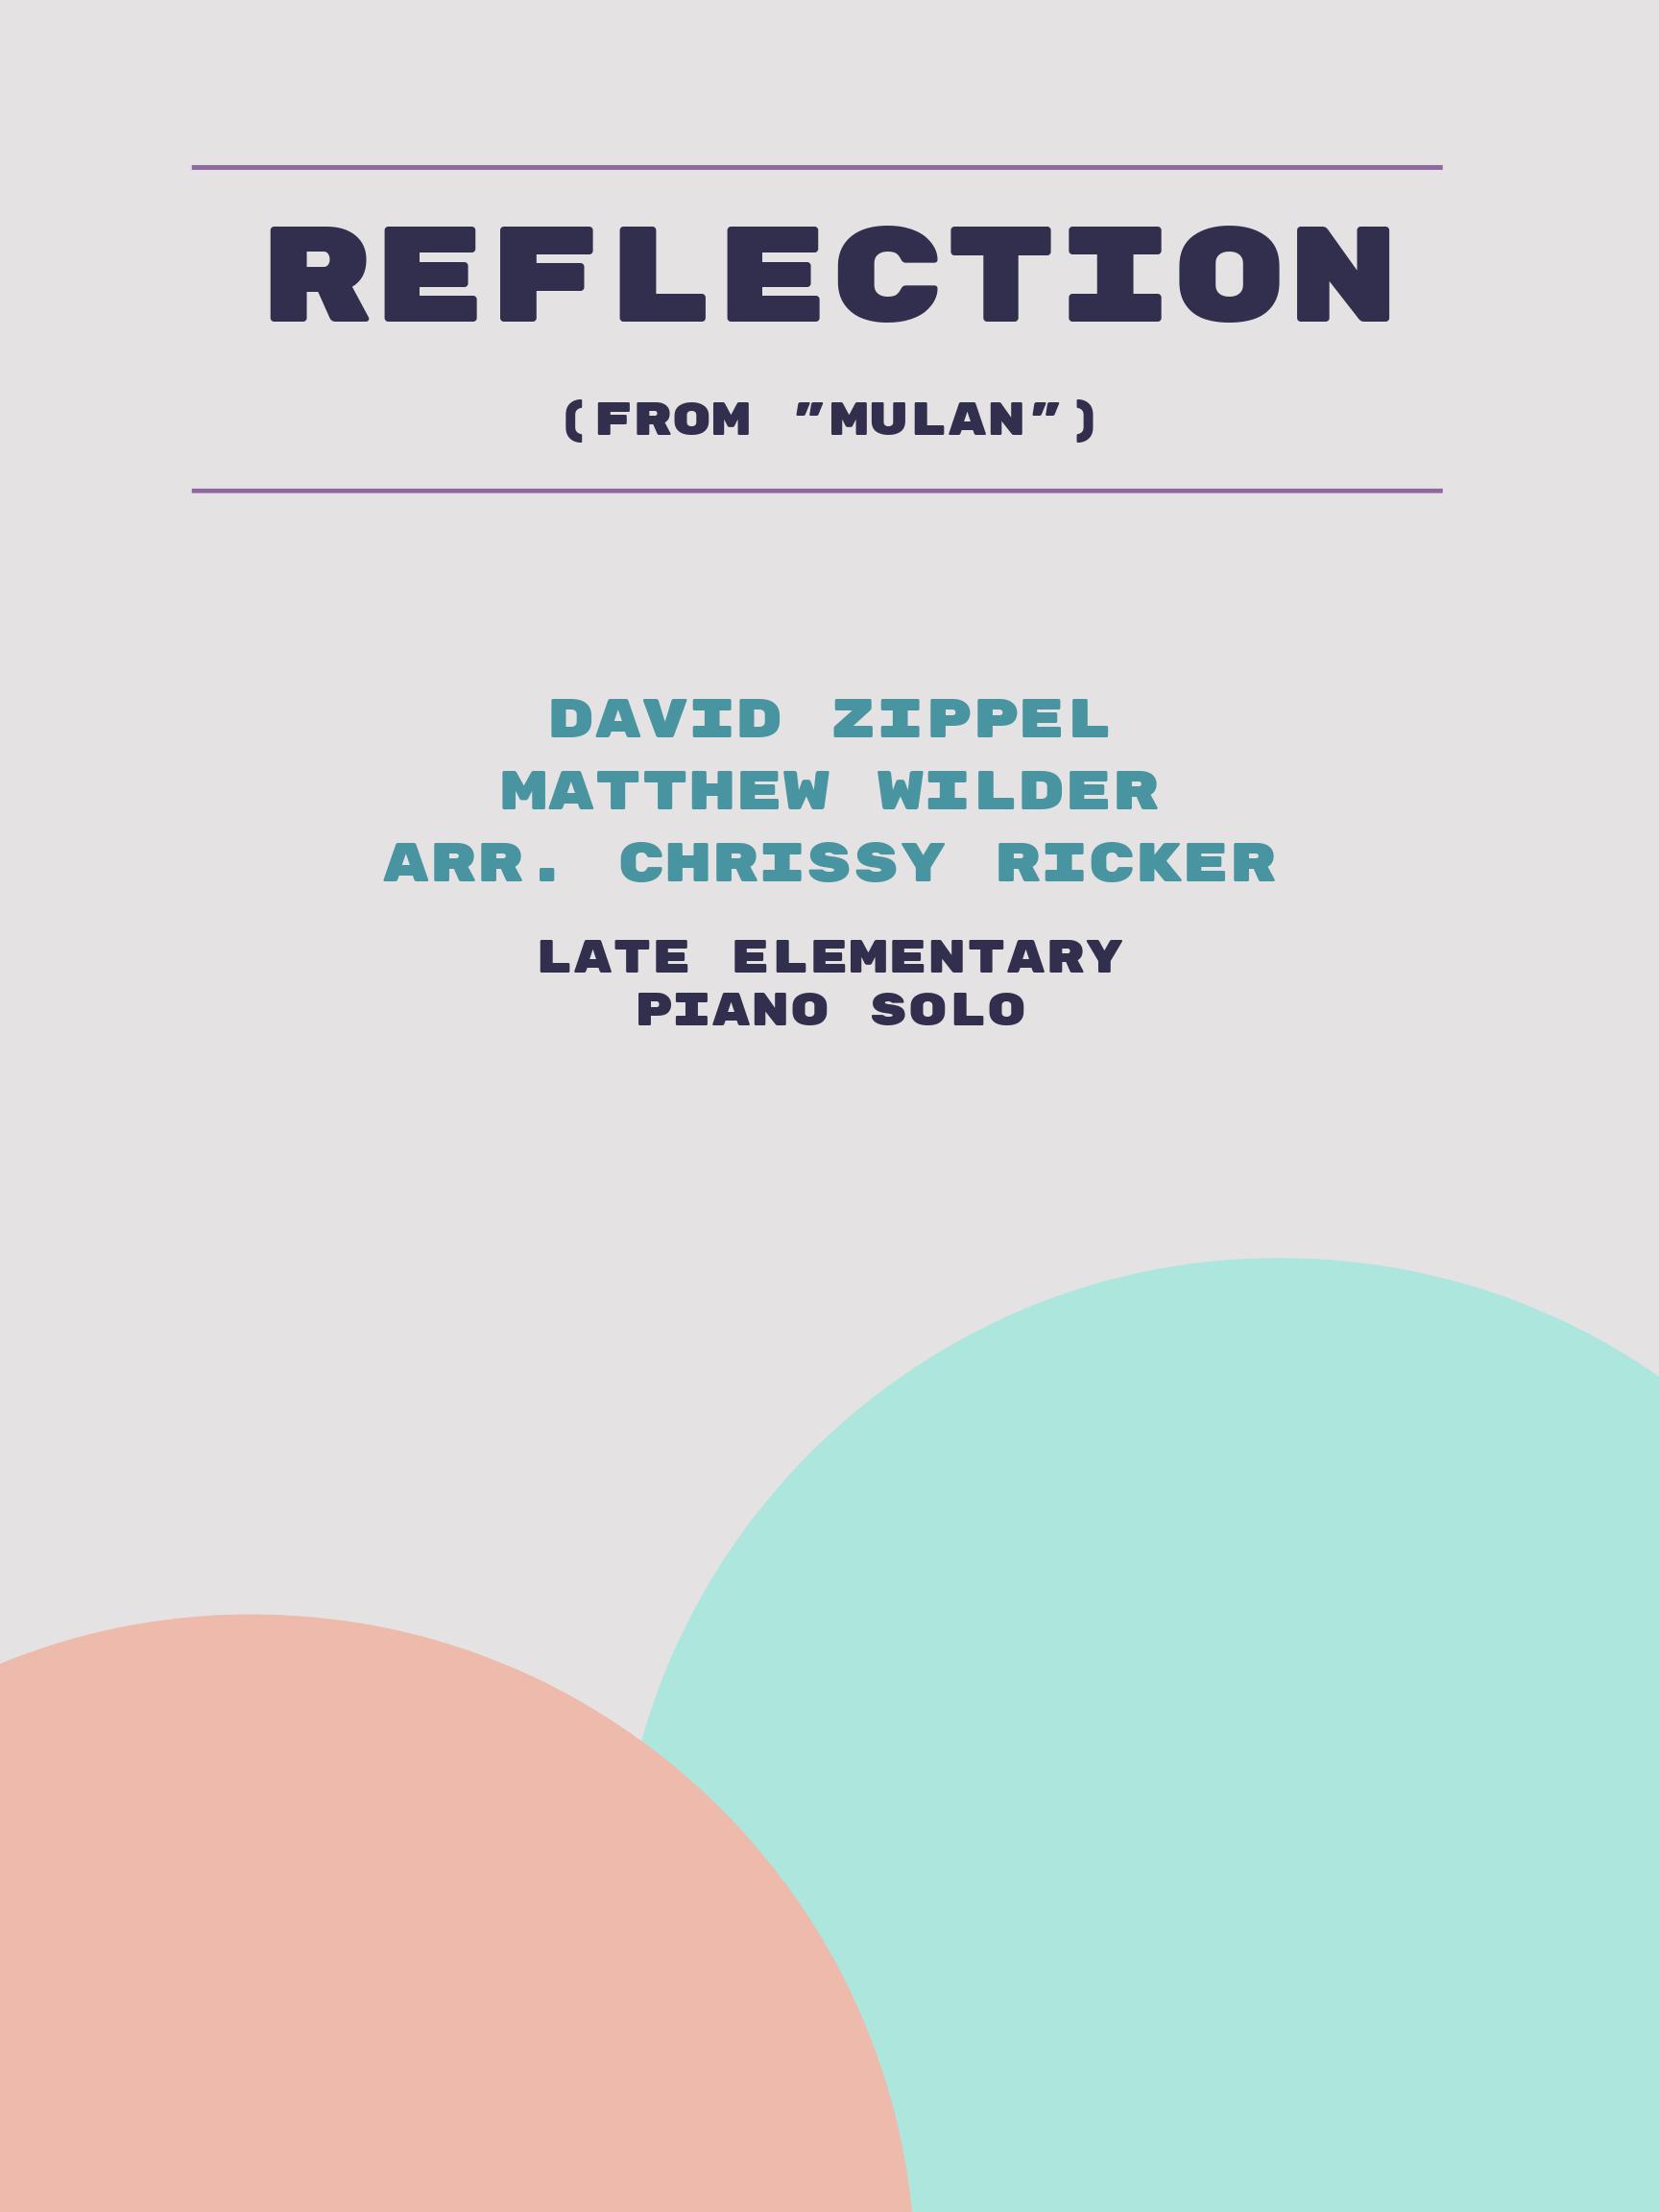 Reflection by David Zippel, Matthew Wilder